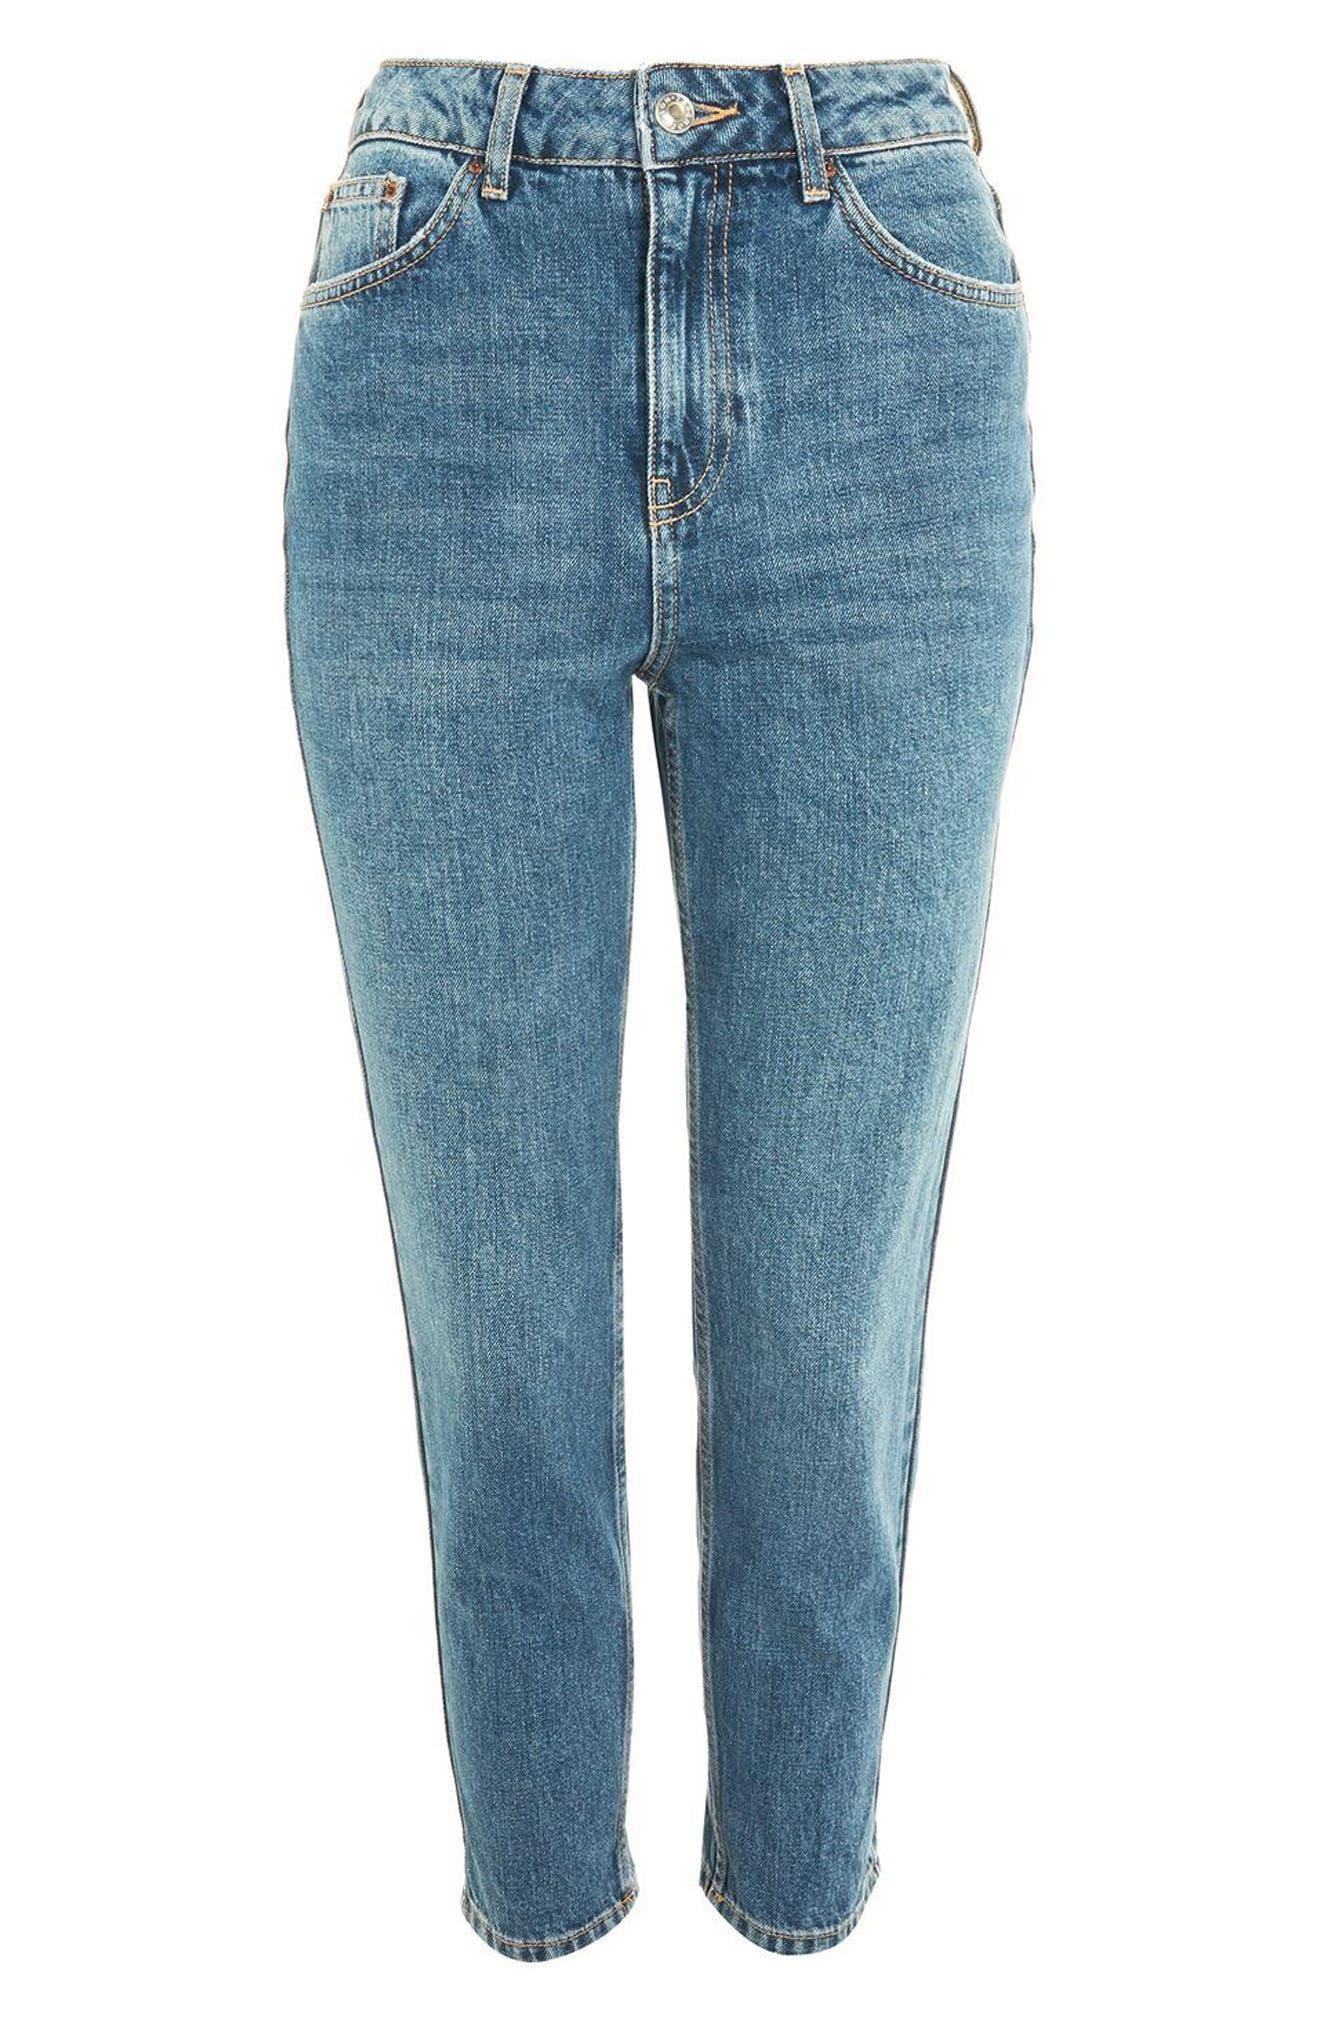 Crop Mom Jeans,                             Alternate thumbnail 4, color,                             Blue